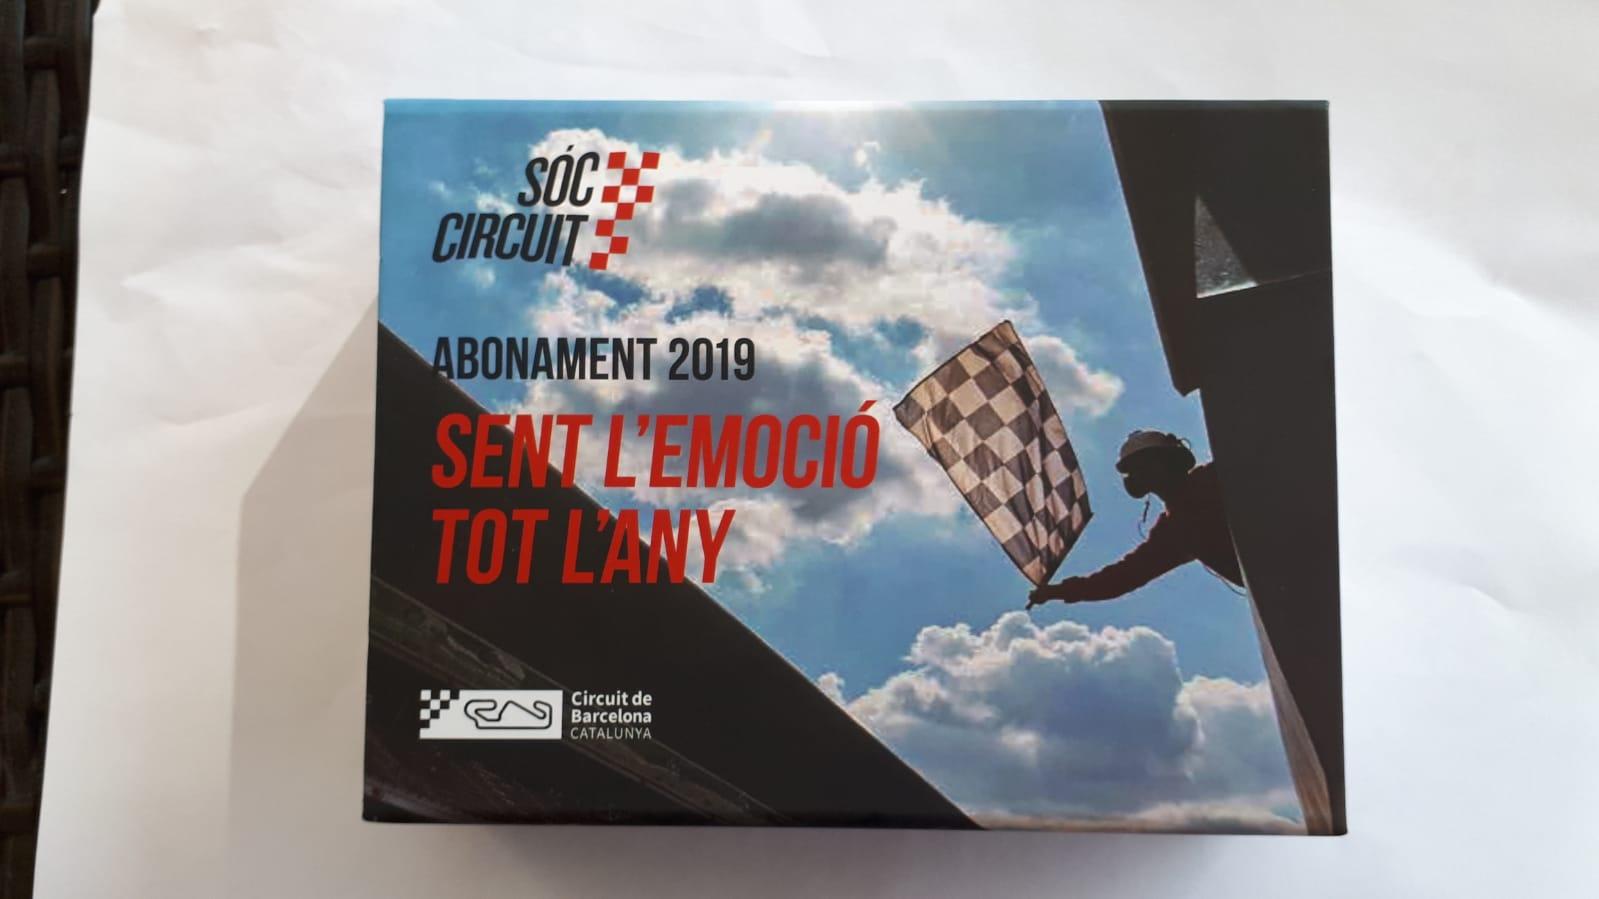 Acto de presentación temporada 2019 Circuit de Catalunya